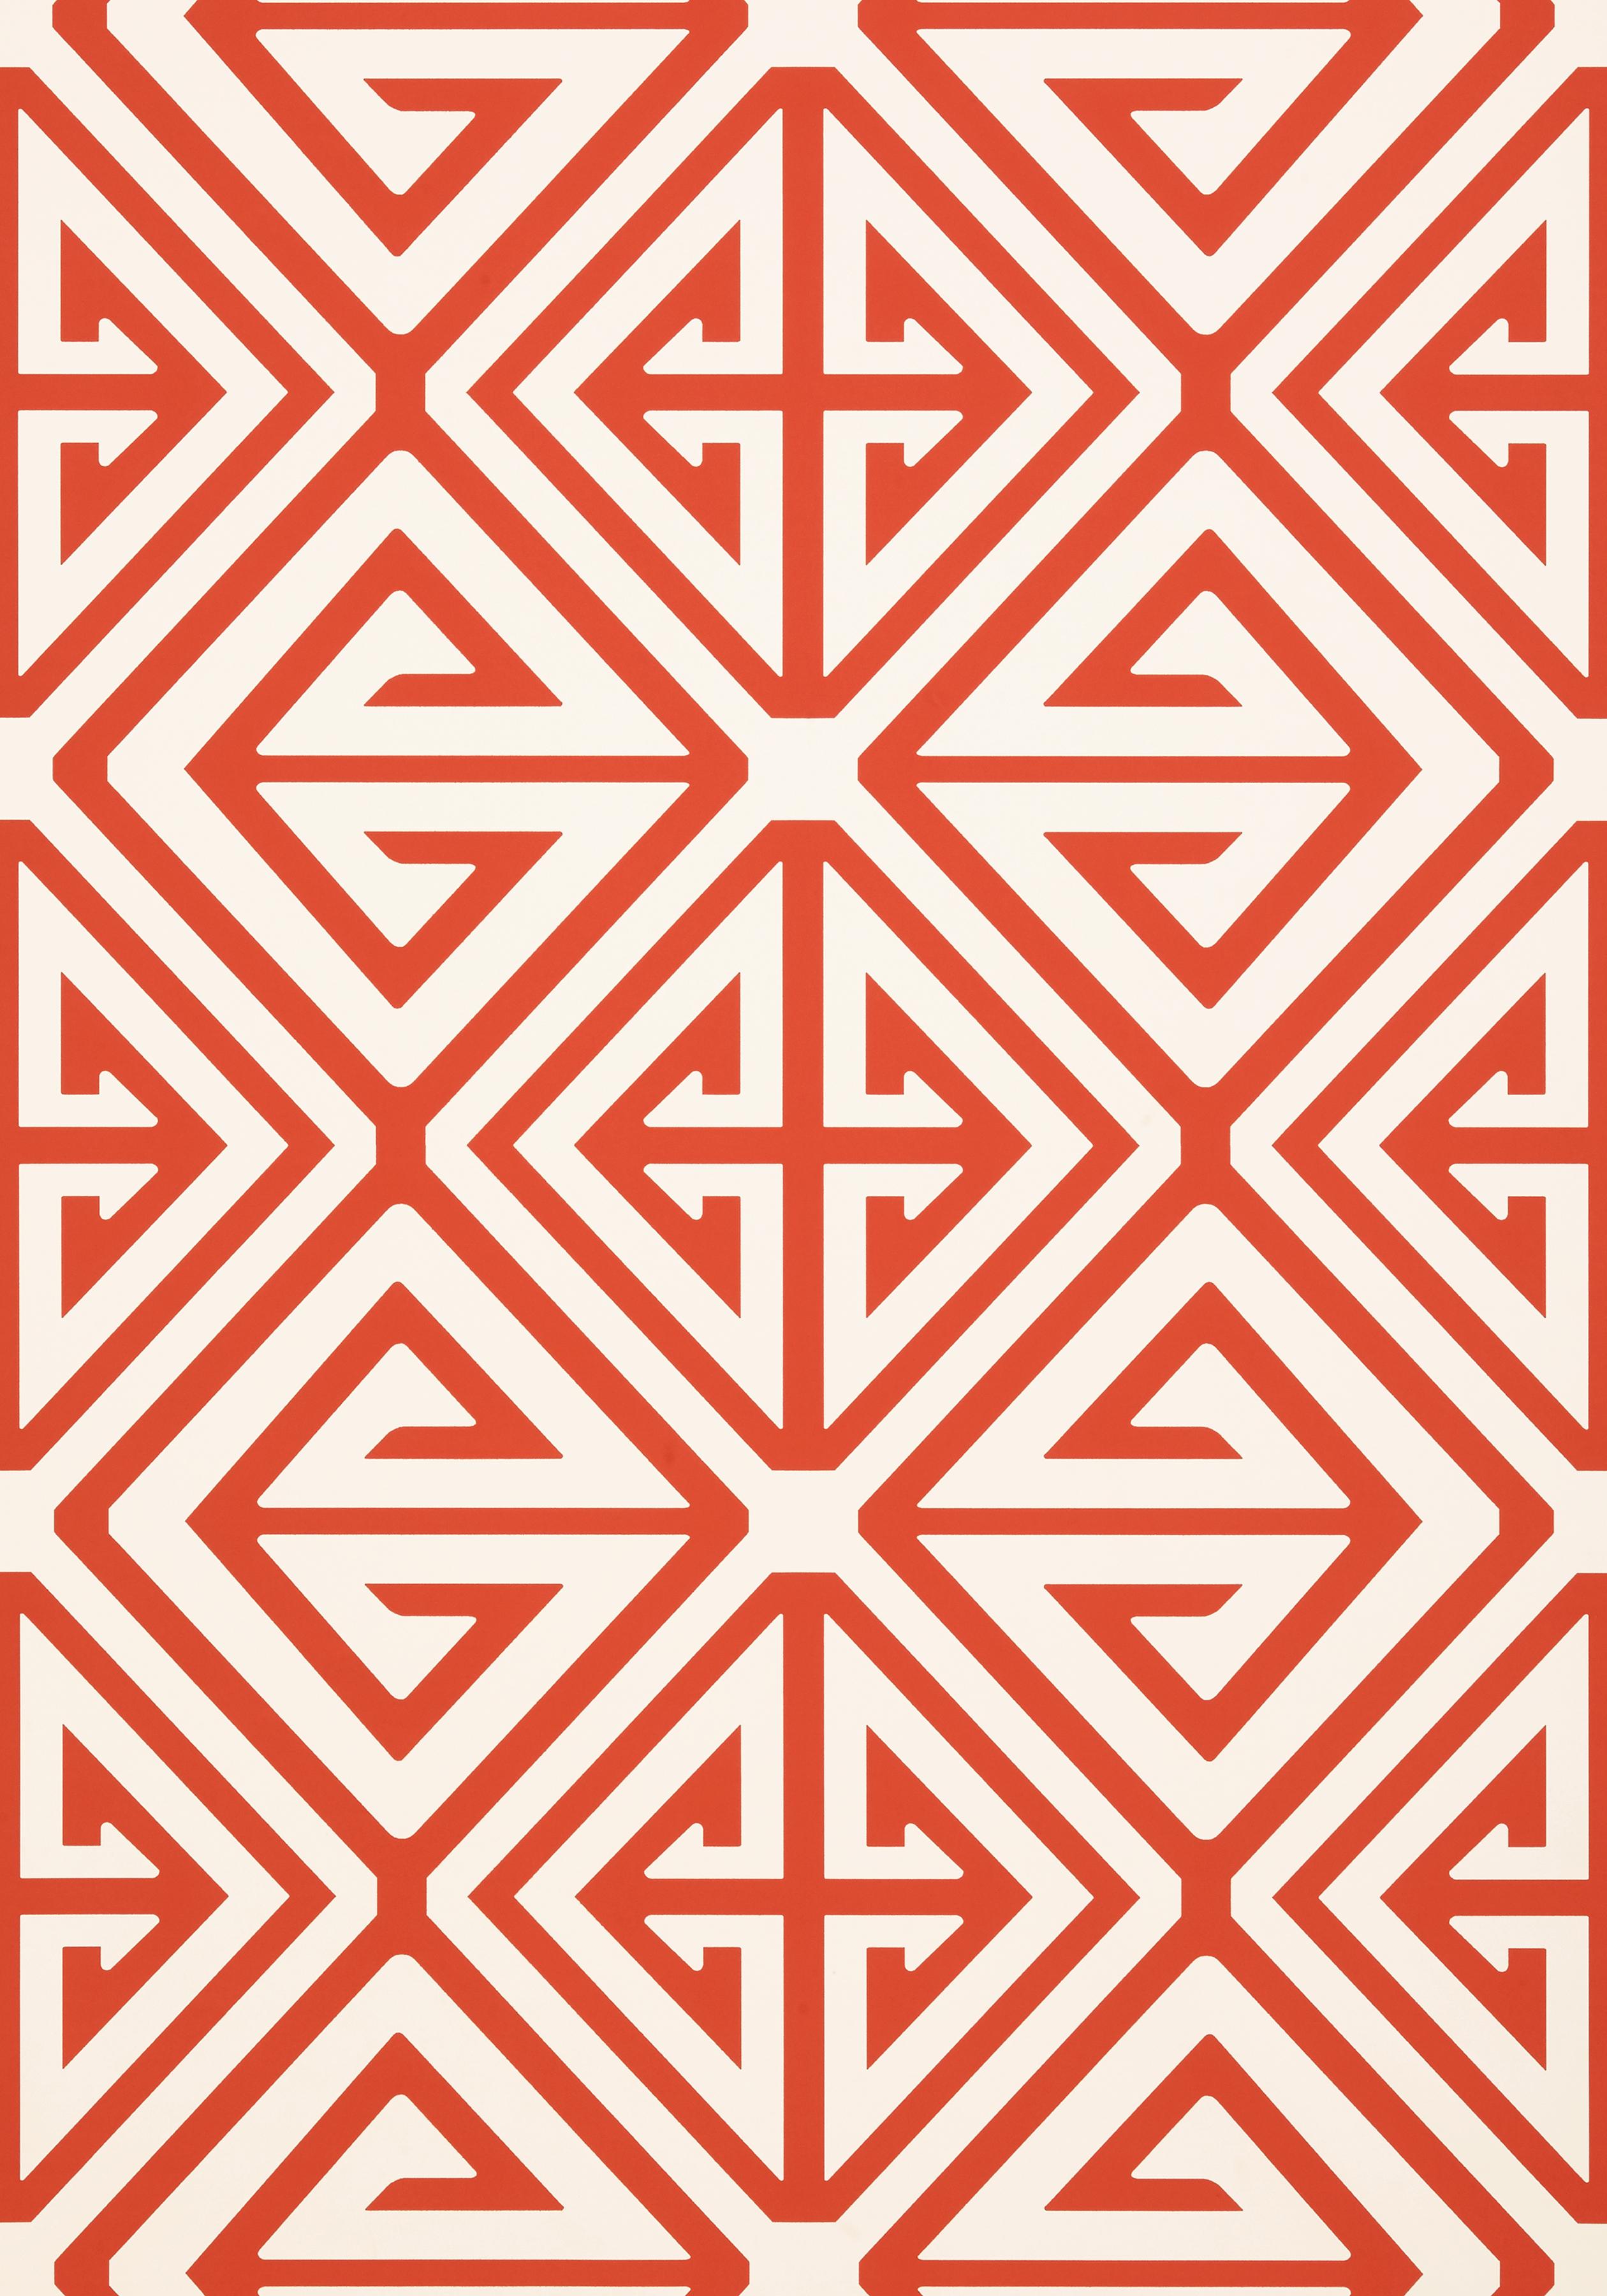 DEMETRIUS-Coral-T-Collection-Bridgehampton-from-Thibaut-wallpaper-wp424918-1